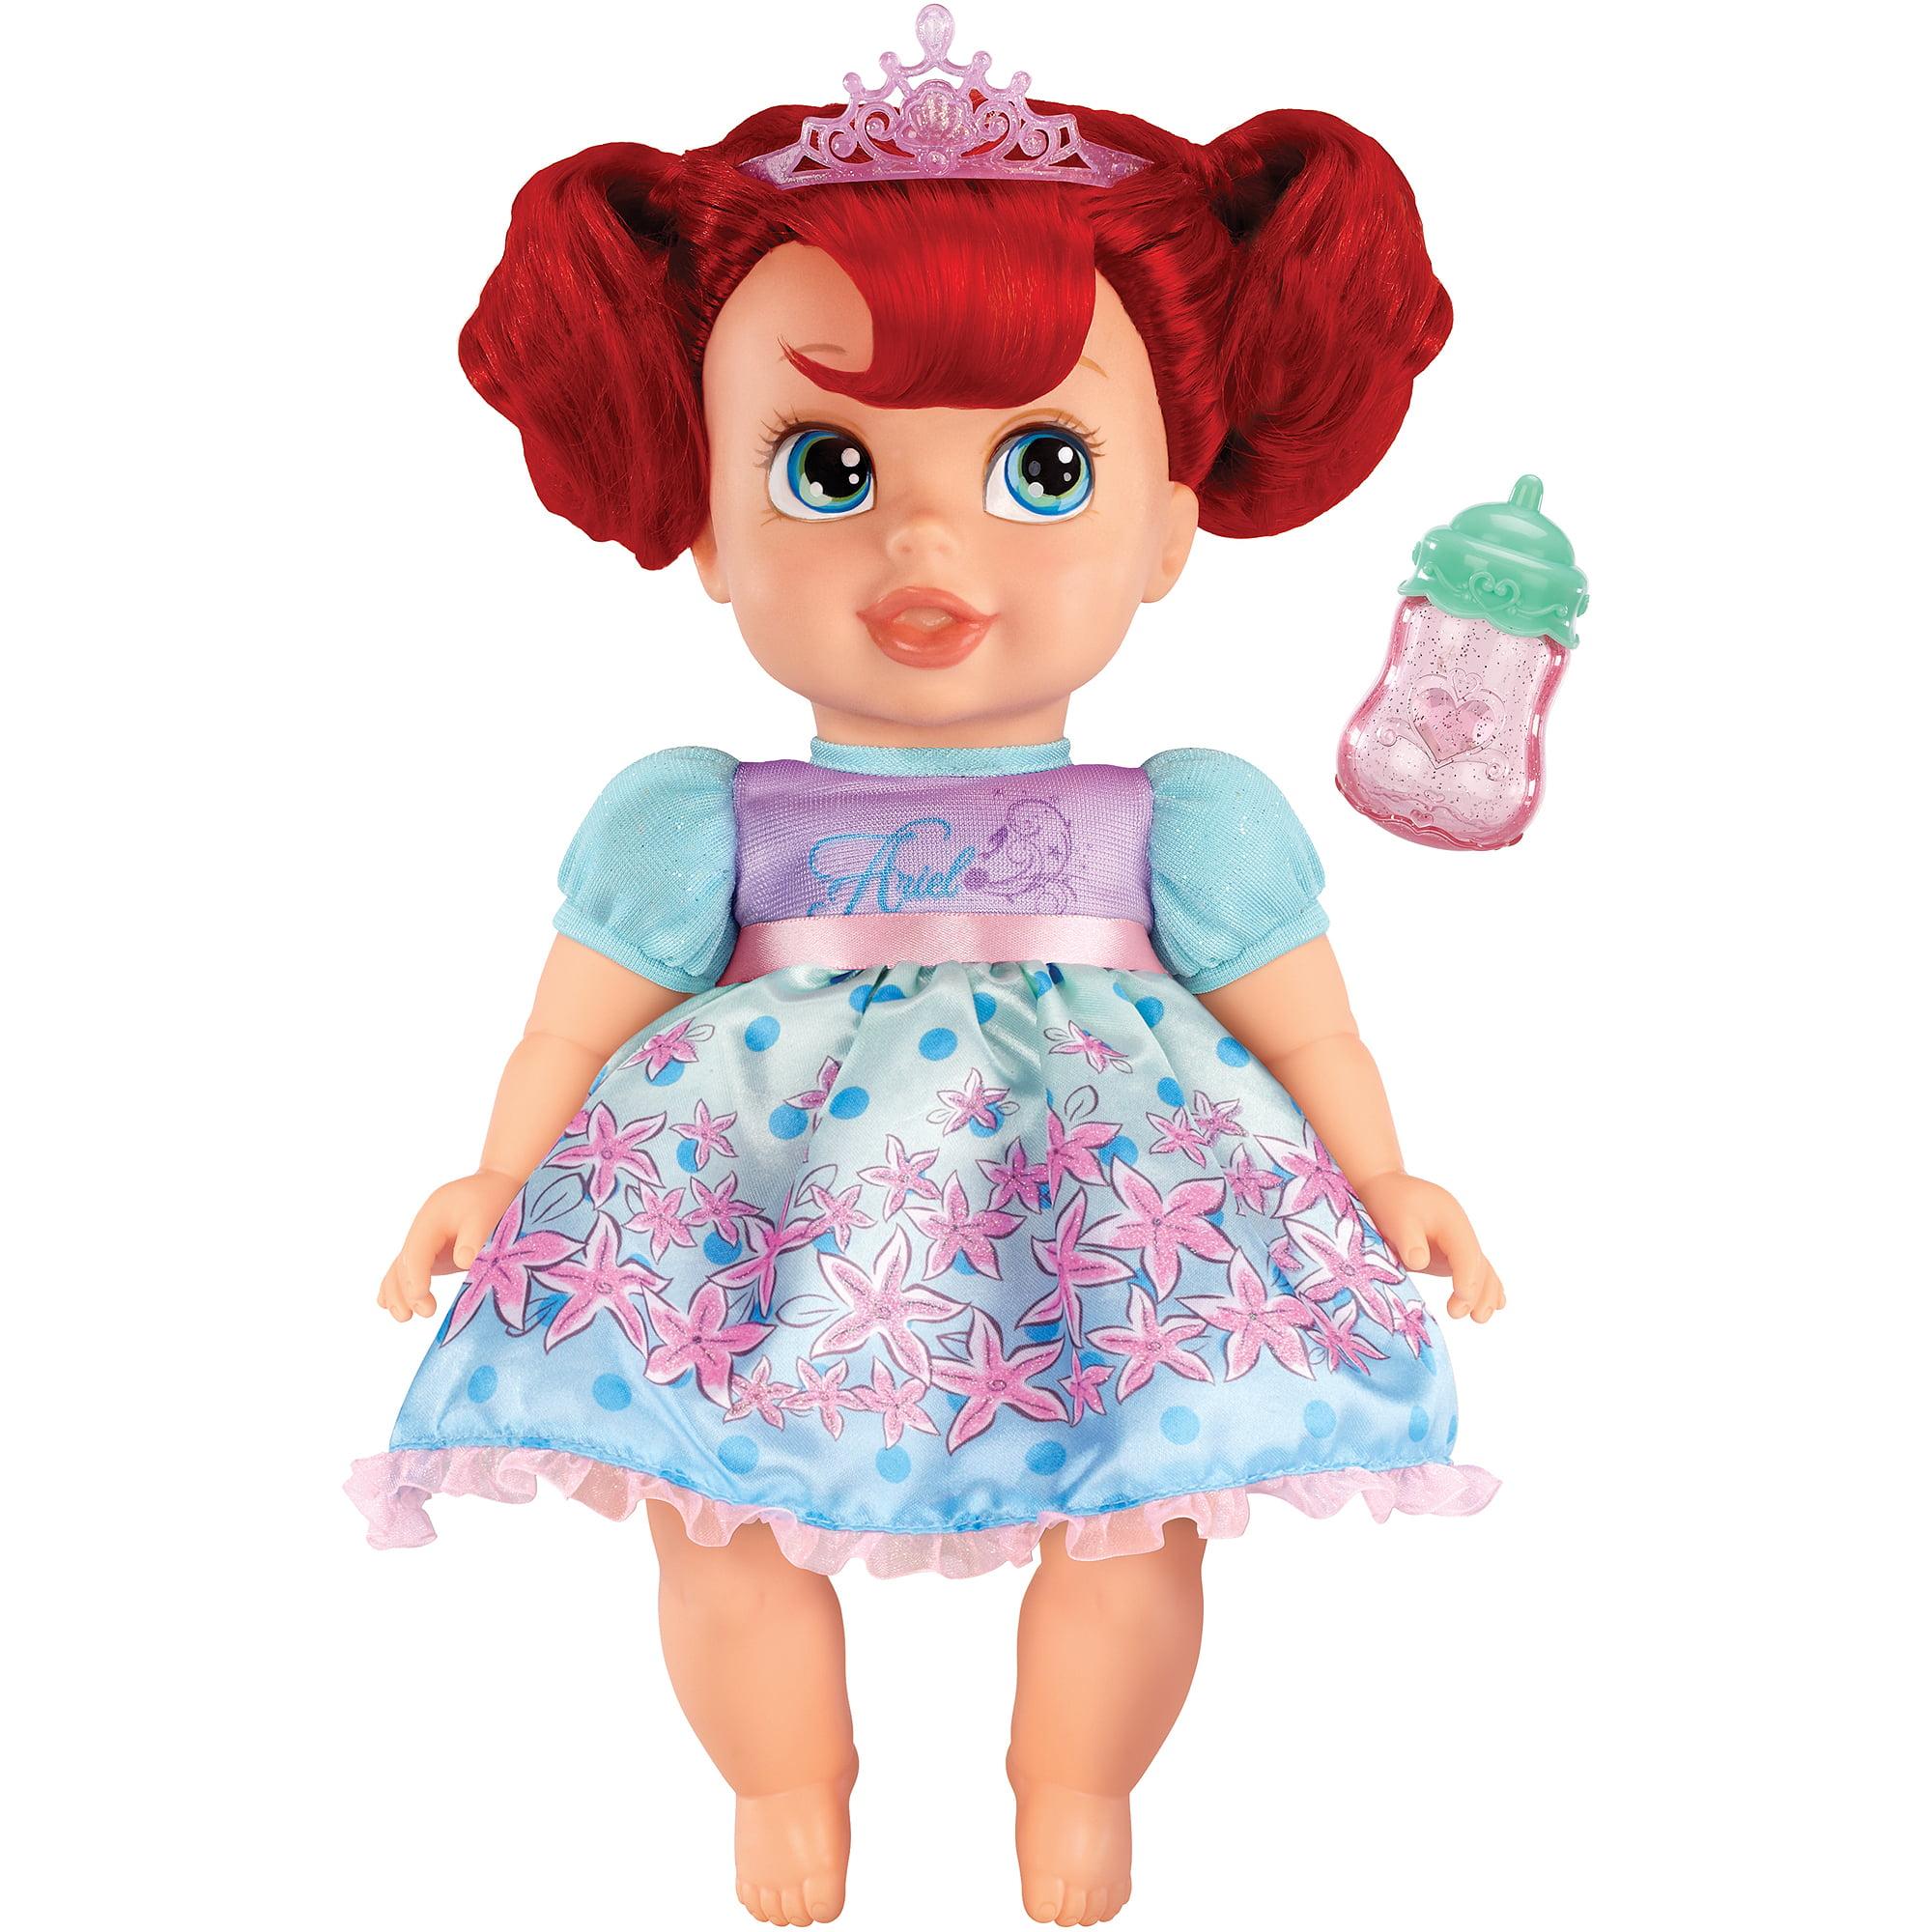 Disney Princess Babies Dolls | www.pixshark.com - Images ...